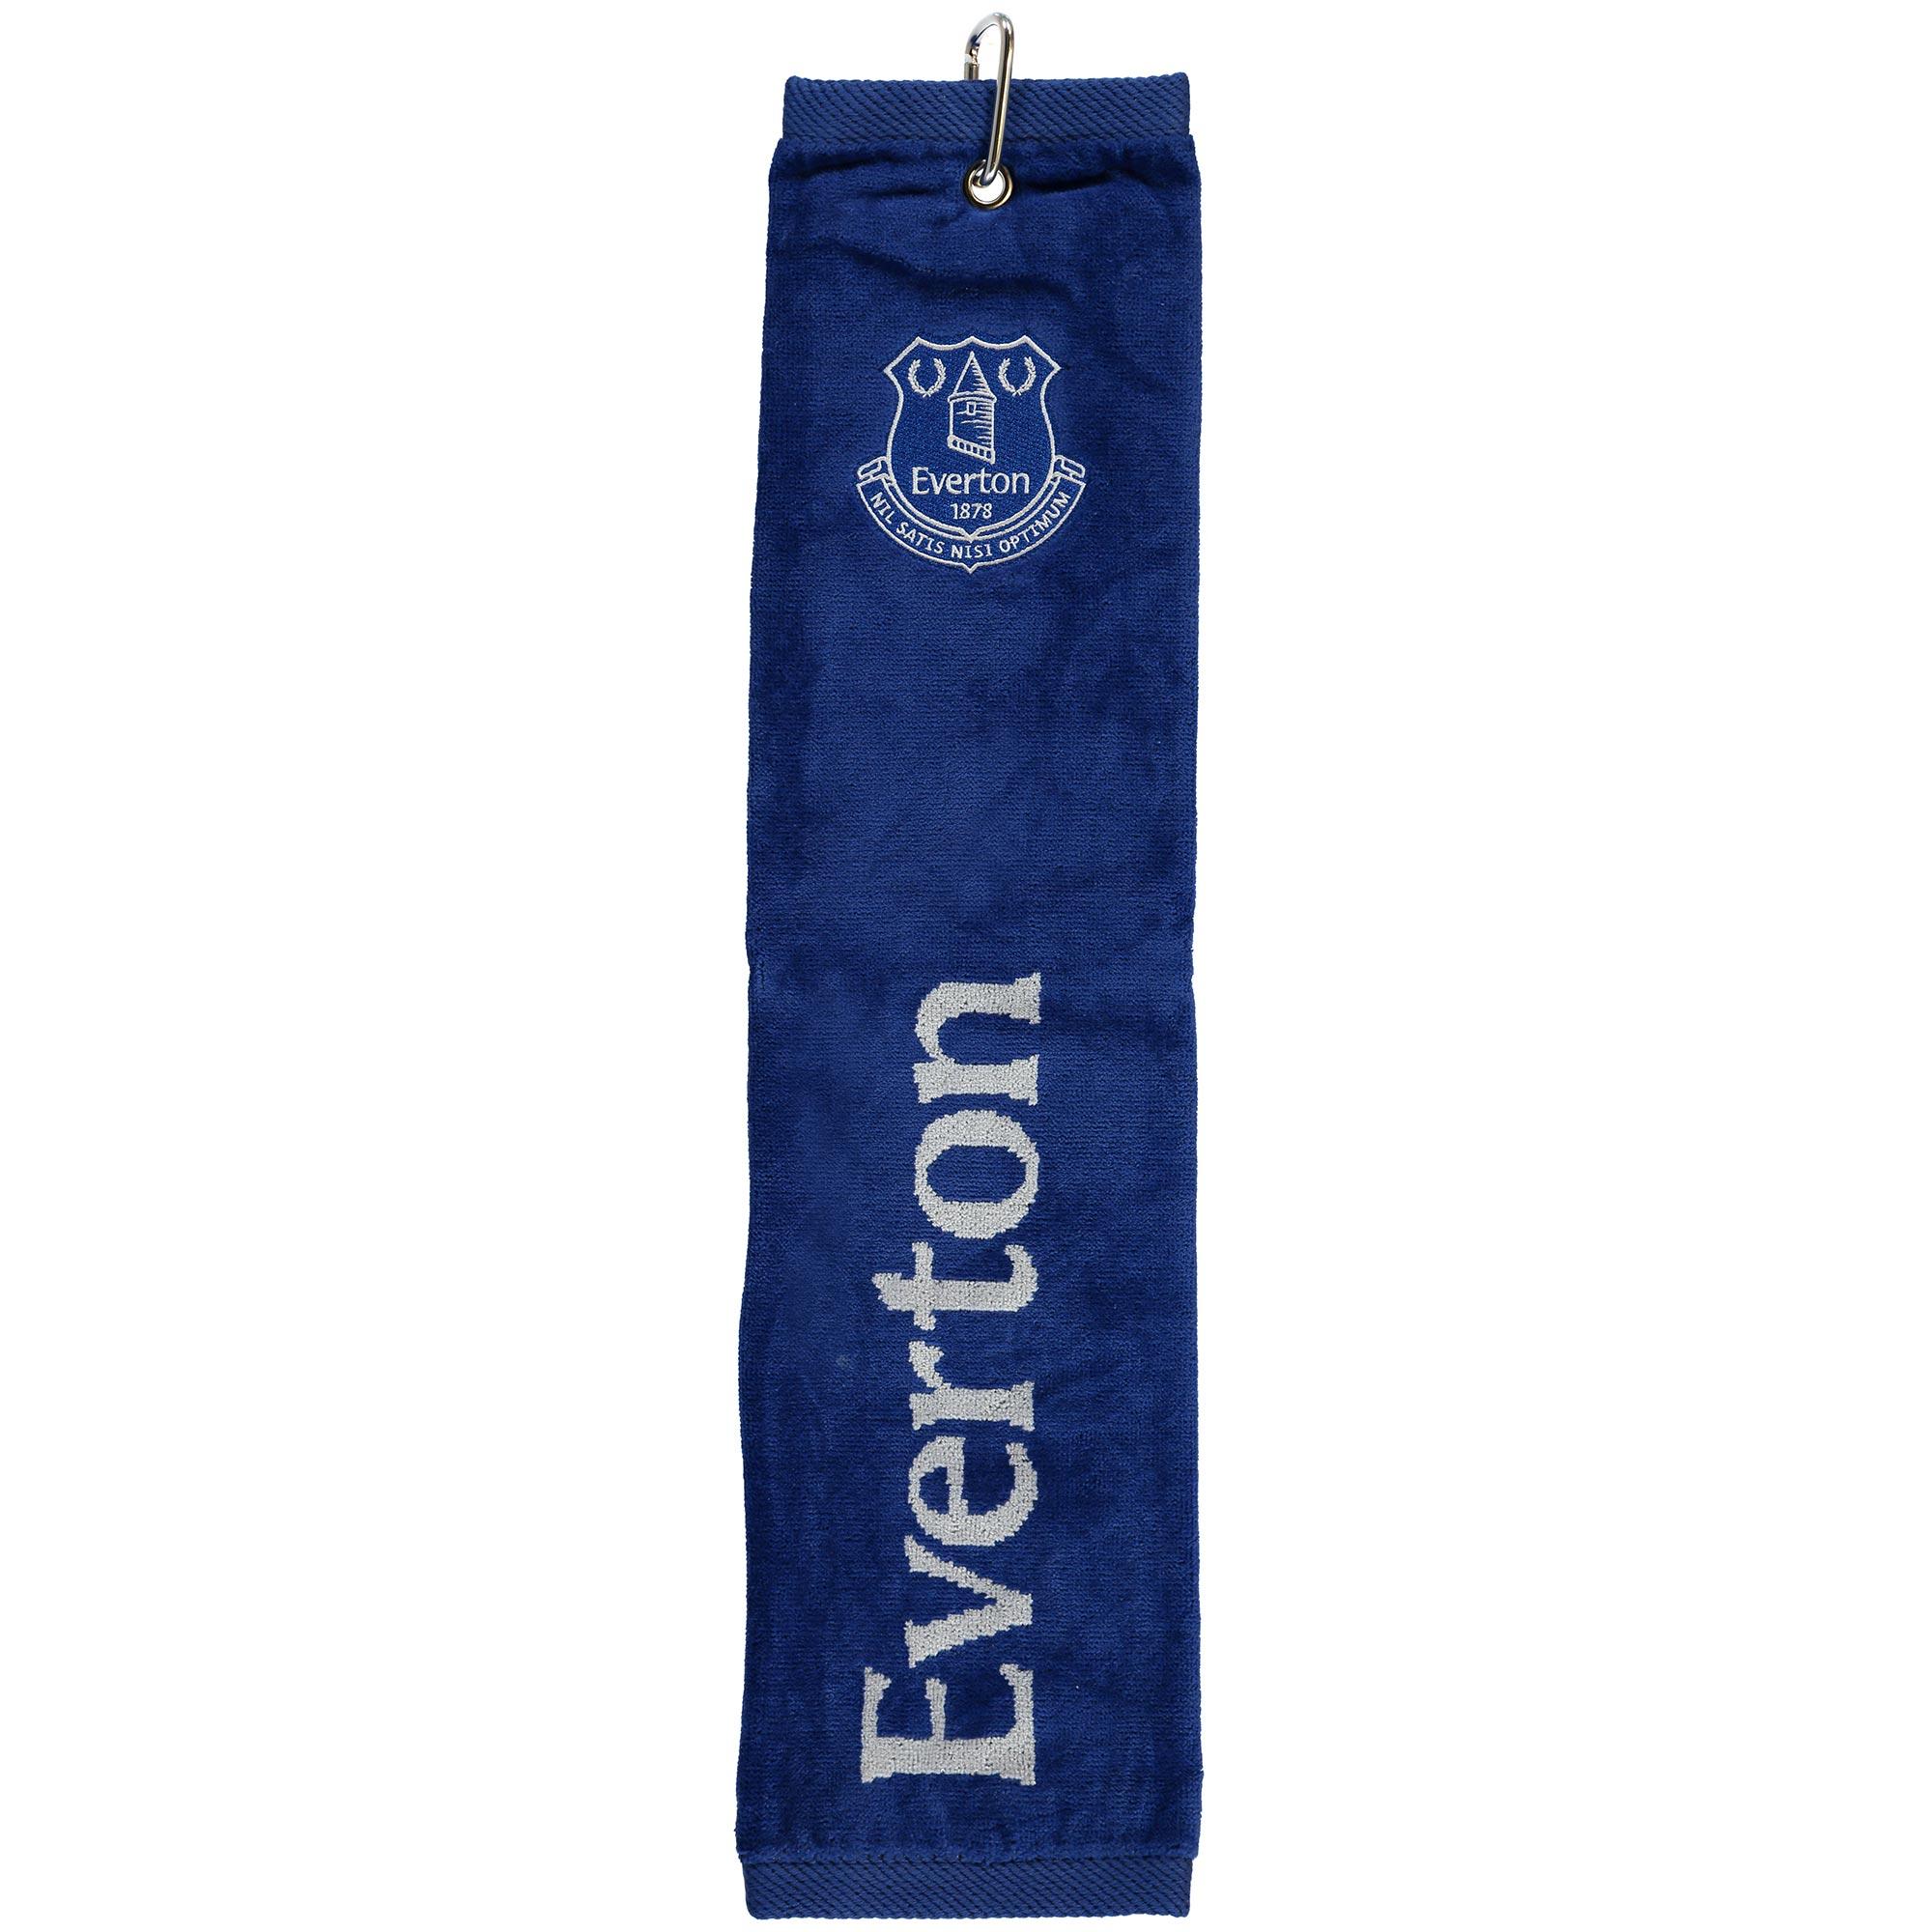 Everton Tri-Fold Golf Towel